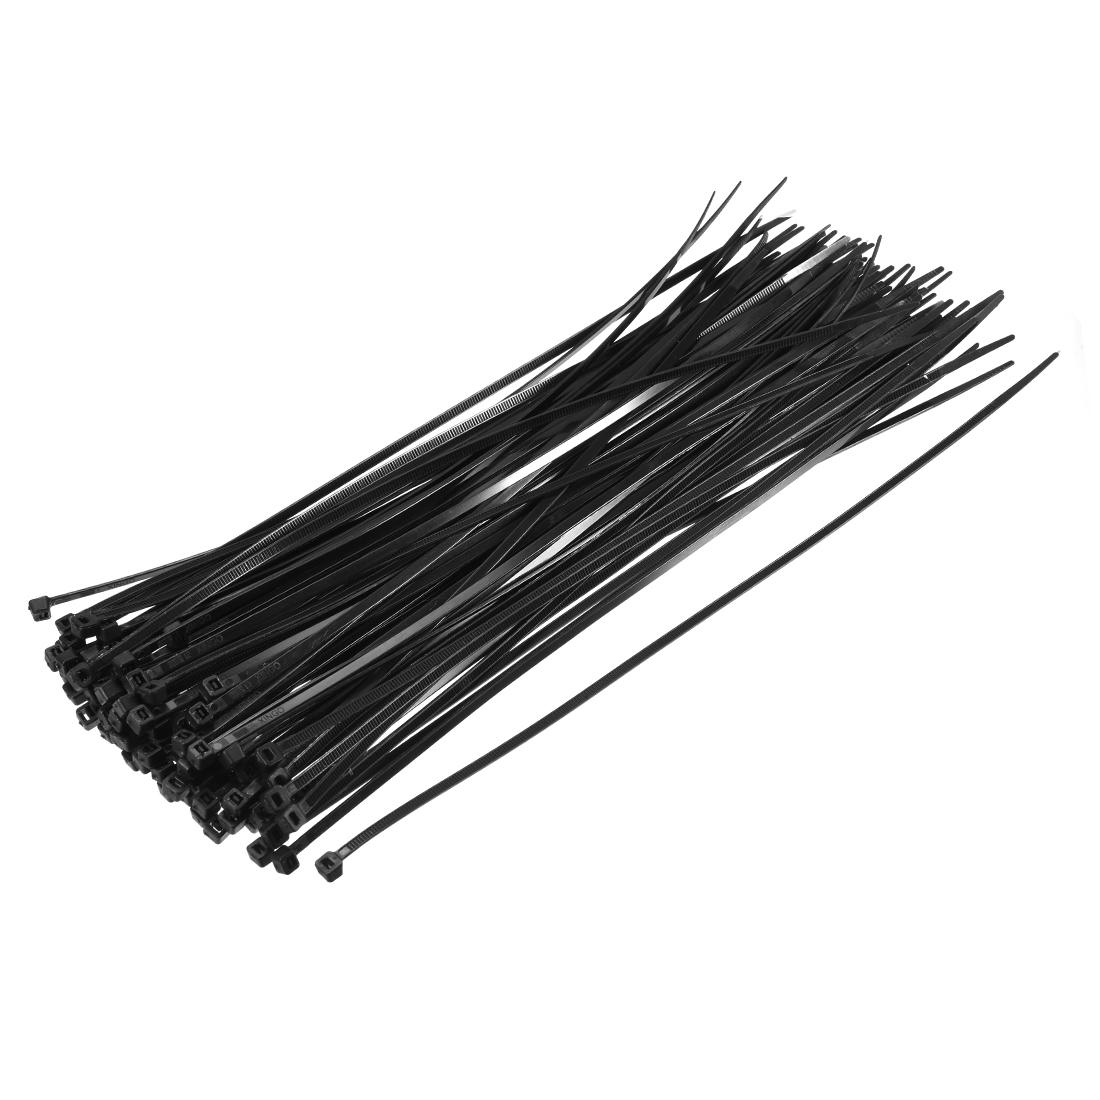 Cable Zip Ties 250mmx2.8mm Self-Locking Nylon Tie Wraps Black 250pcs